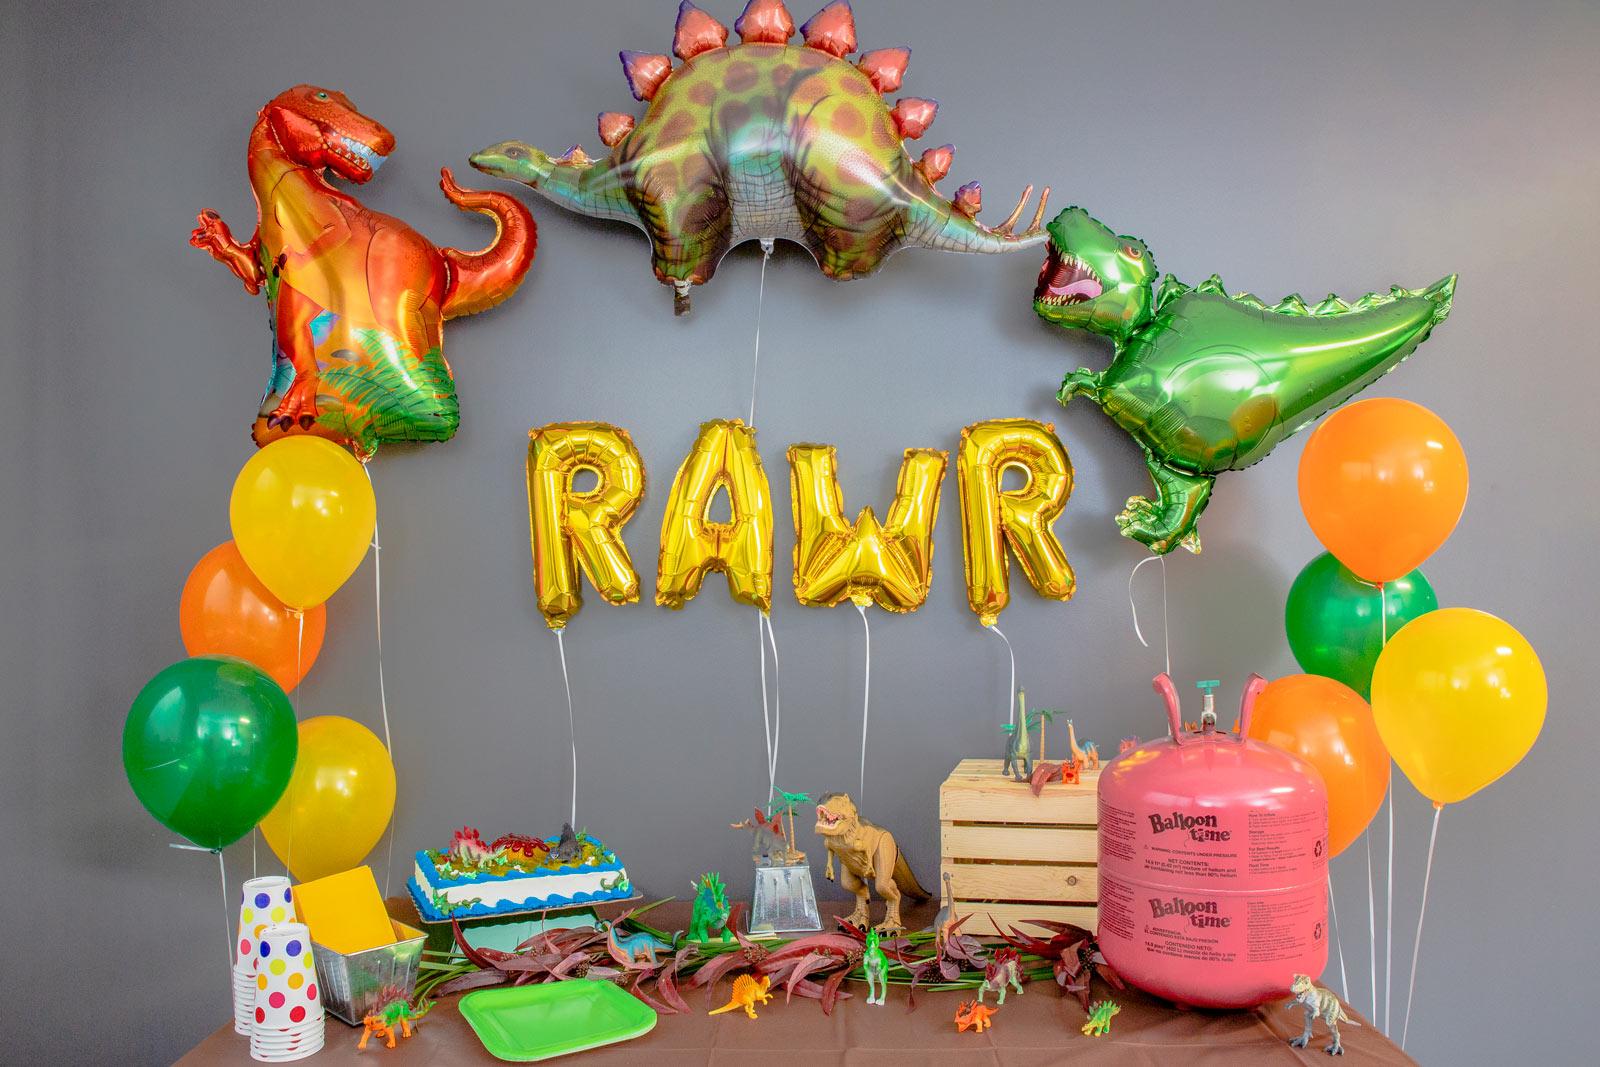 Dinosaur themed birthday party decorations